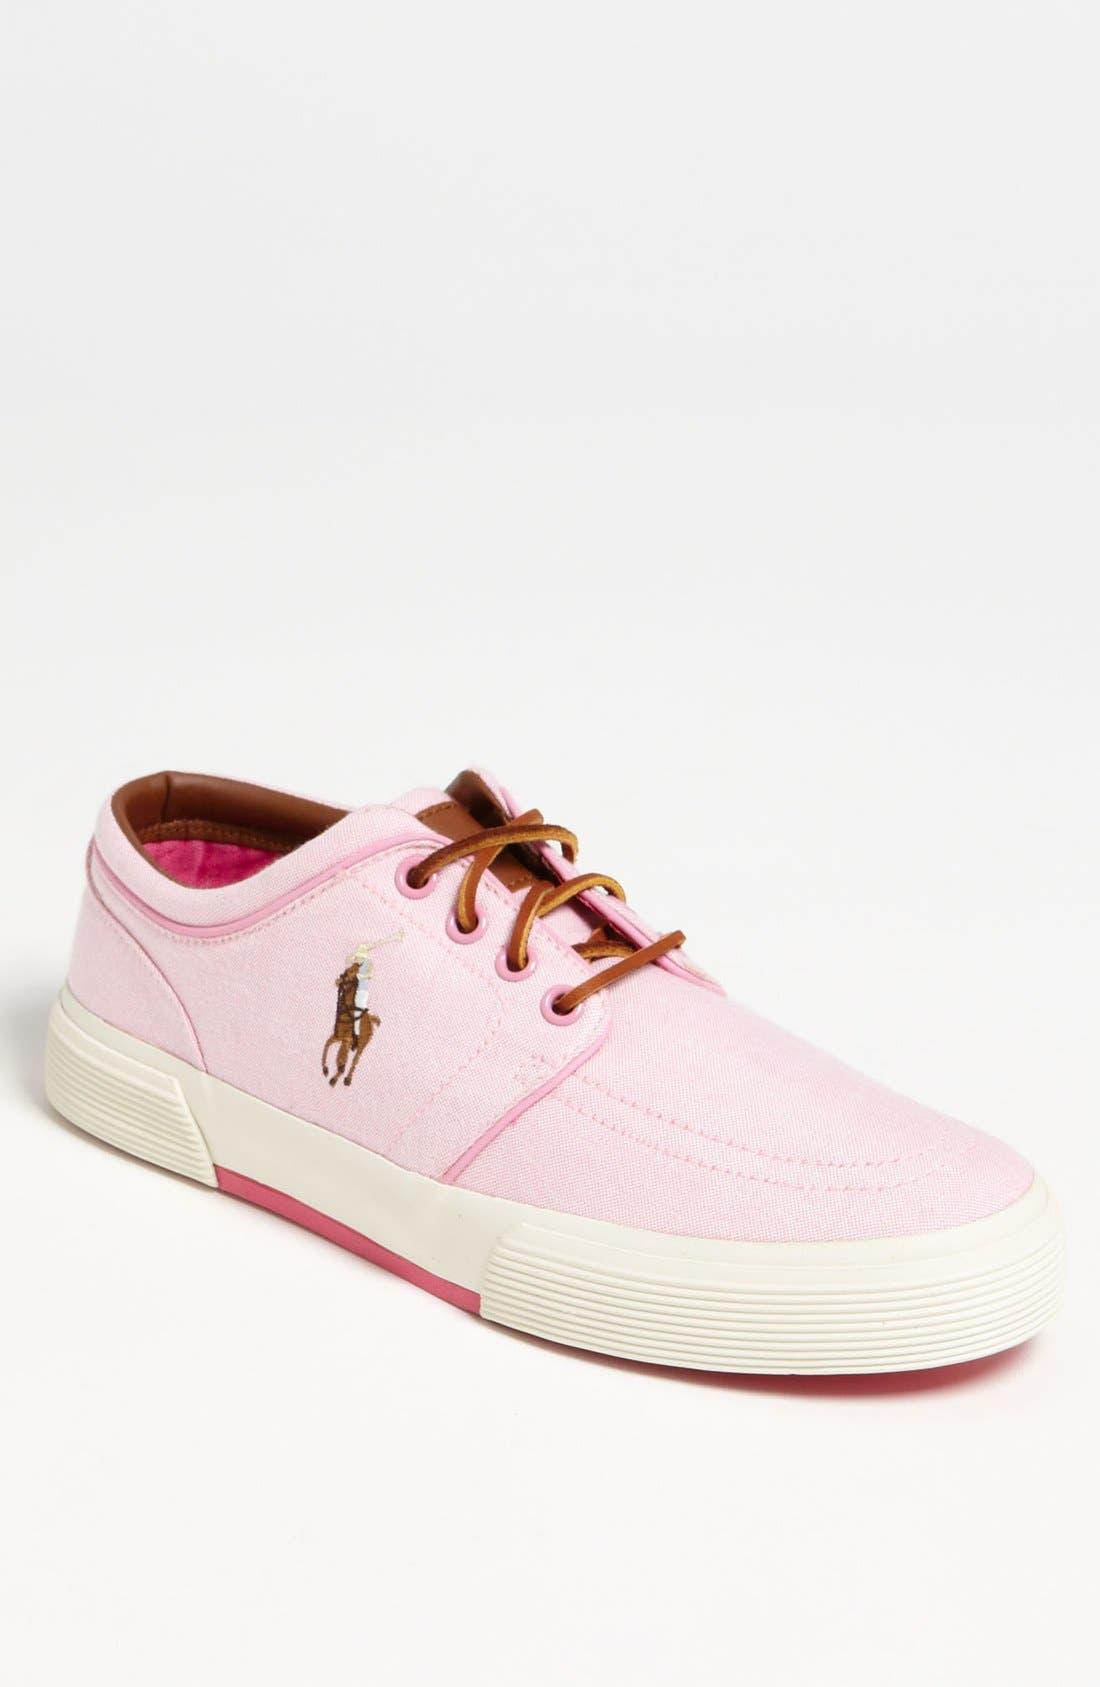 Main Image - Polo Ralph Lauren 'Faxon' Sneaker (Men)